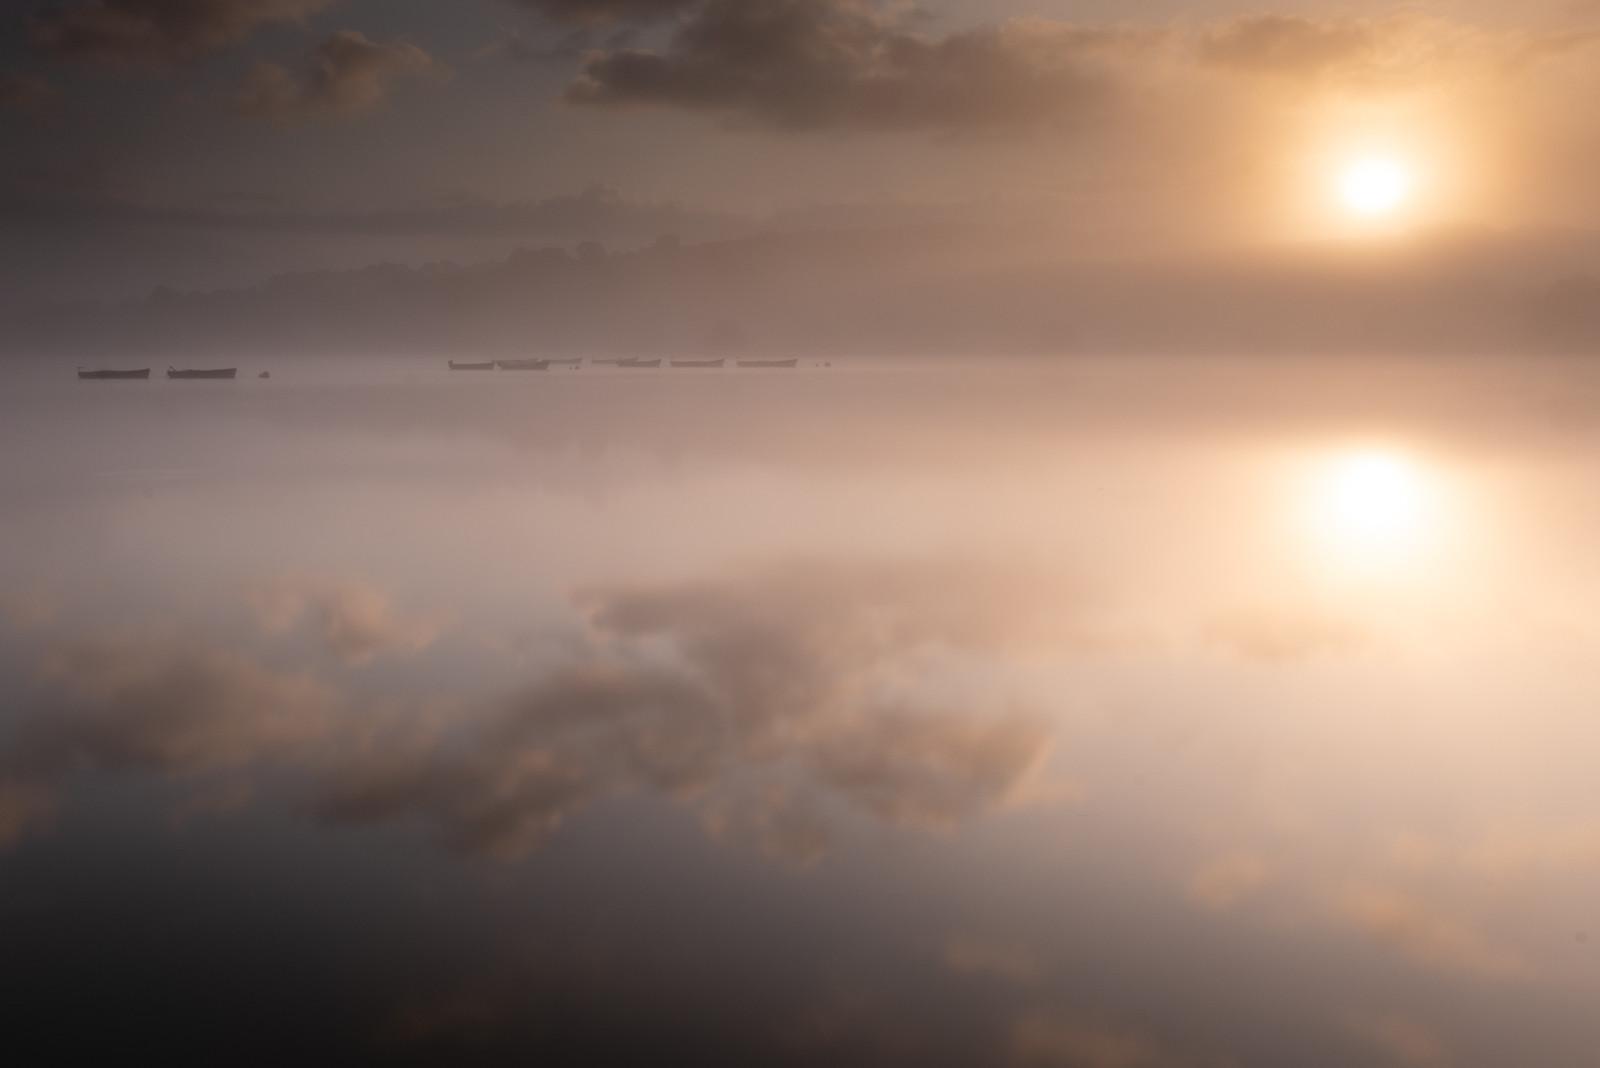 PDI - Corbet Misty Sunrise by Damien McConville (9 marks)